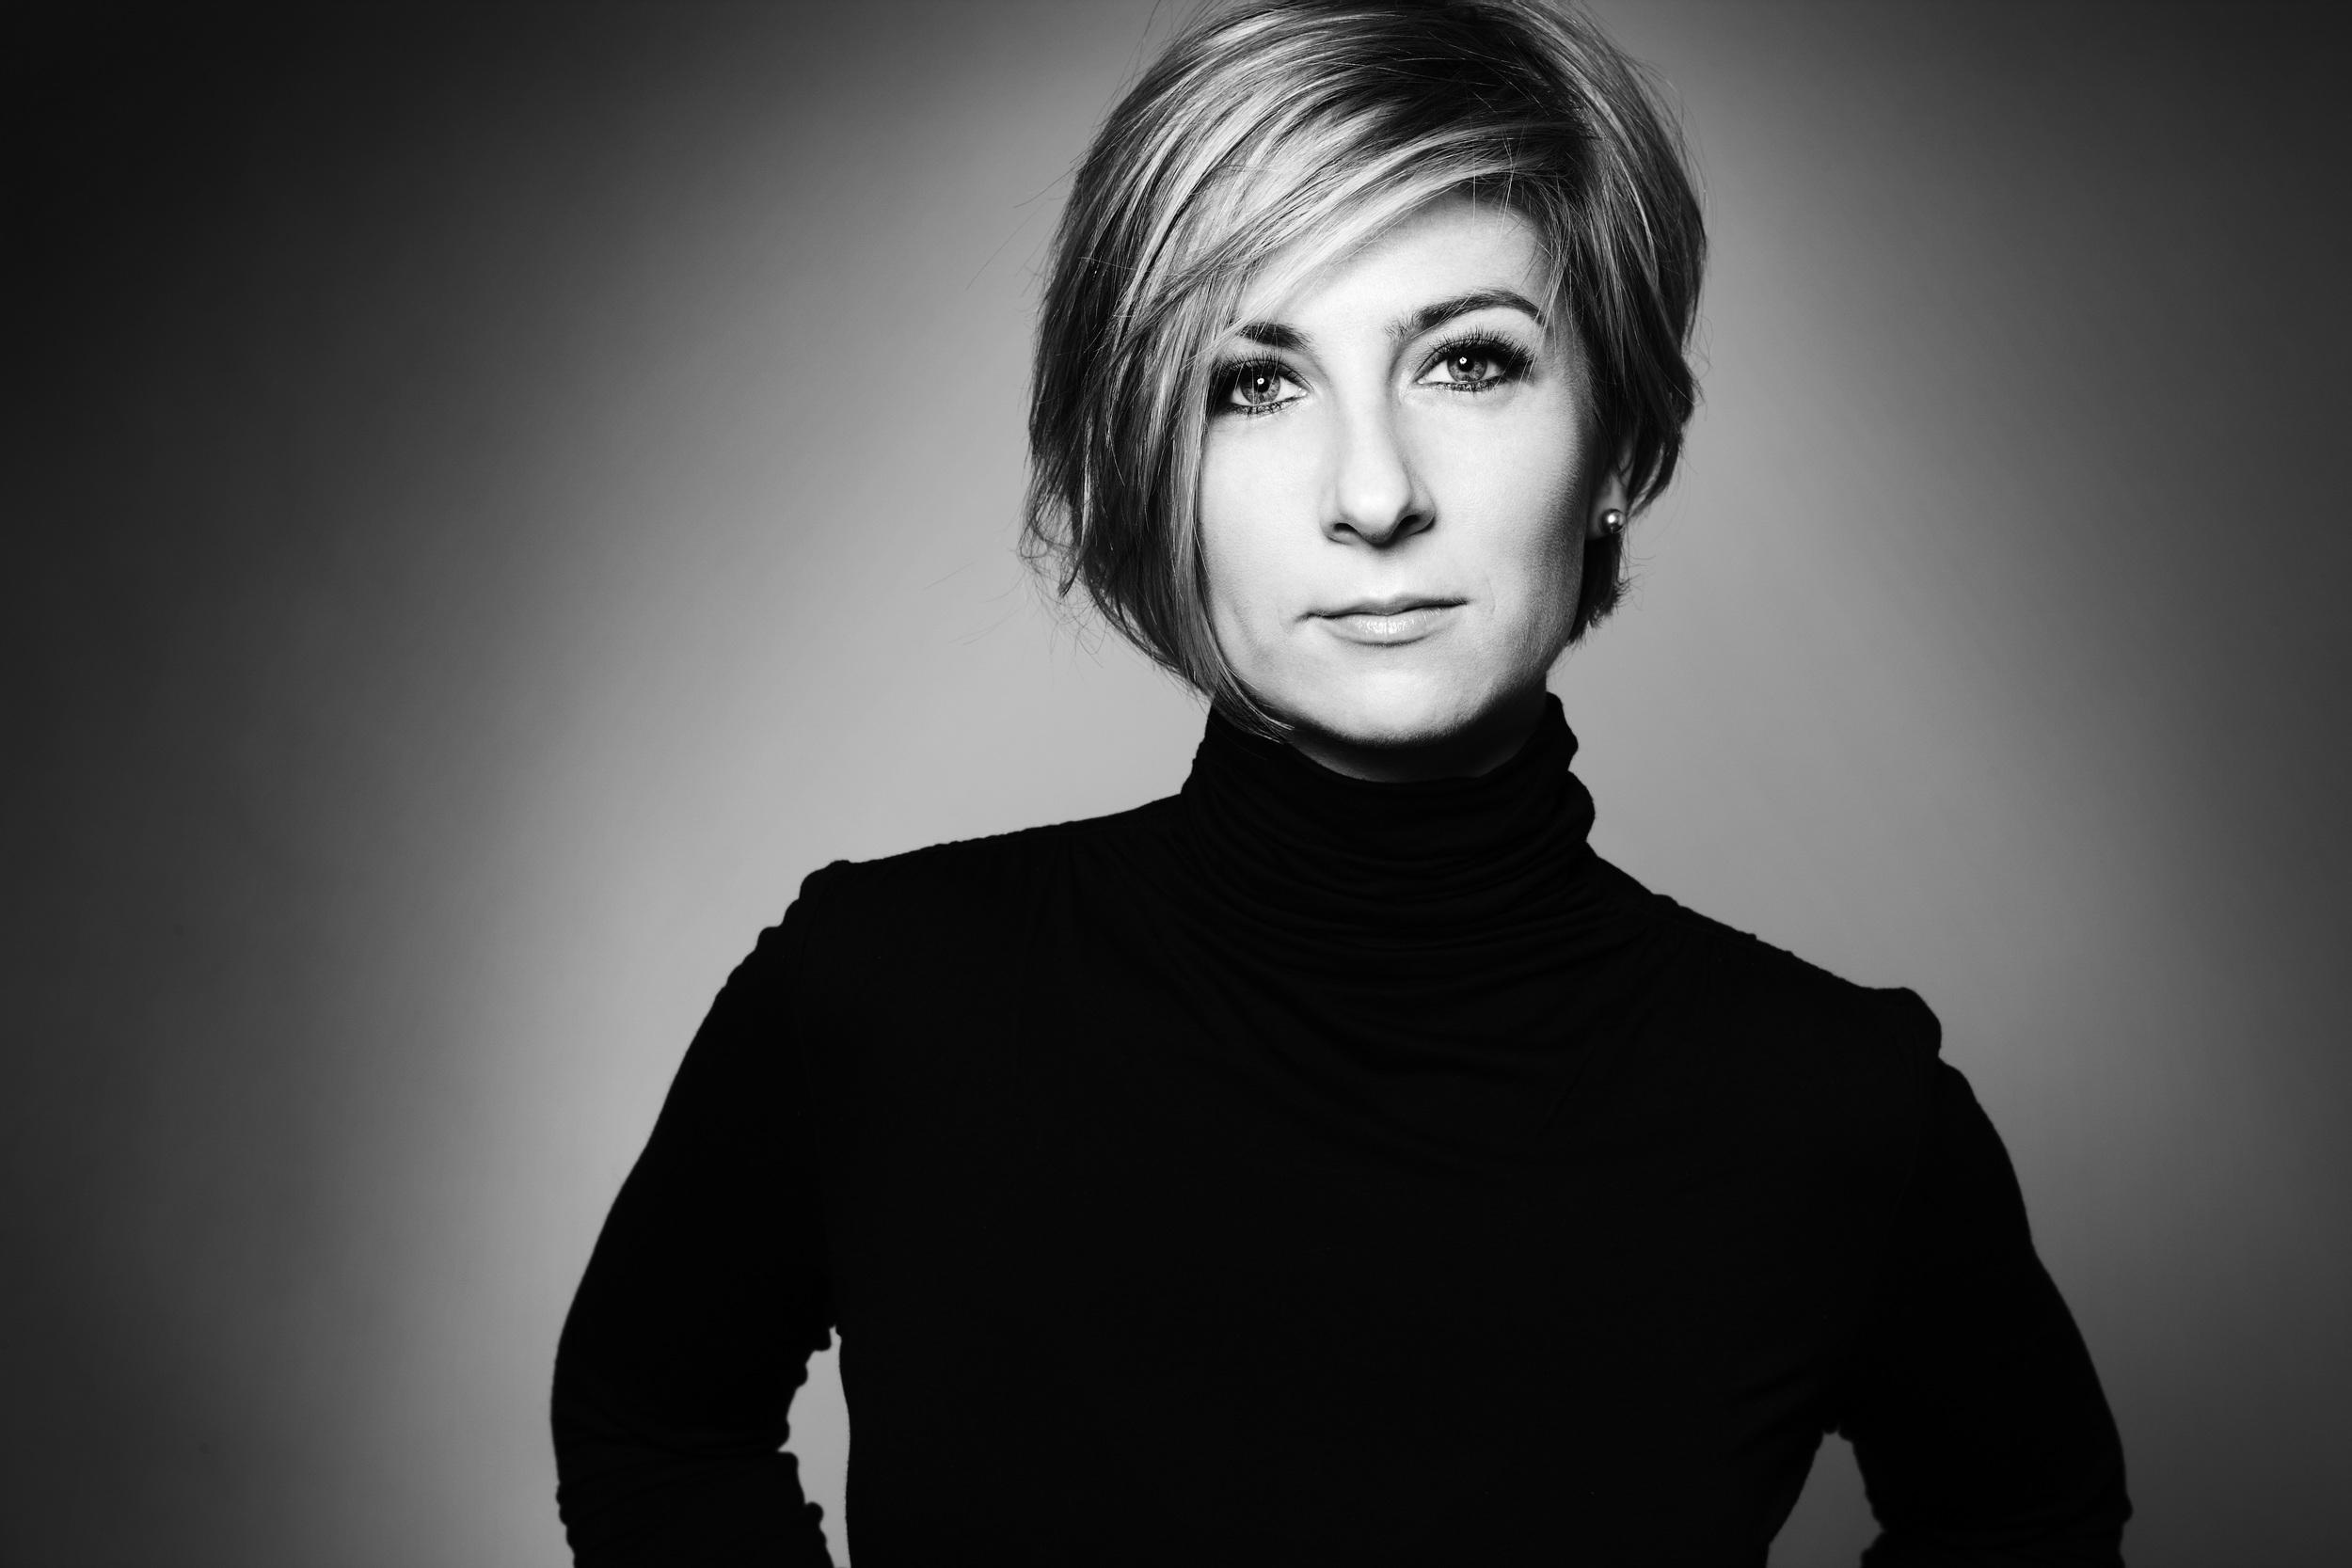 Kiera Duffy (Photo by Steven Laxton)